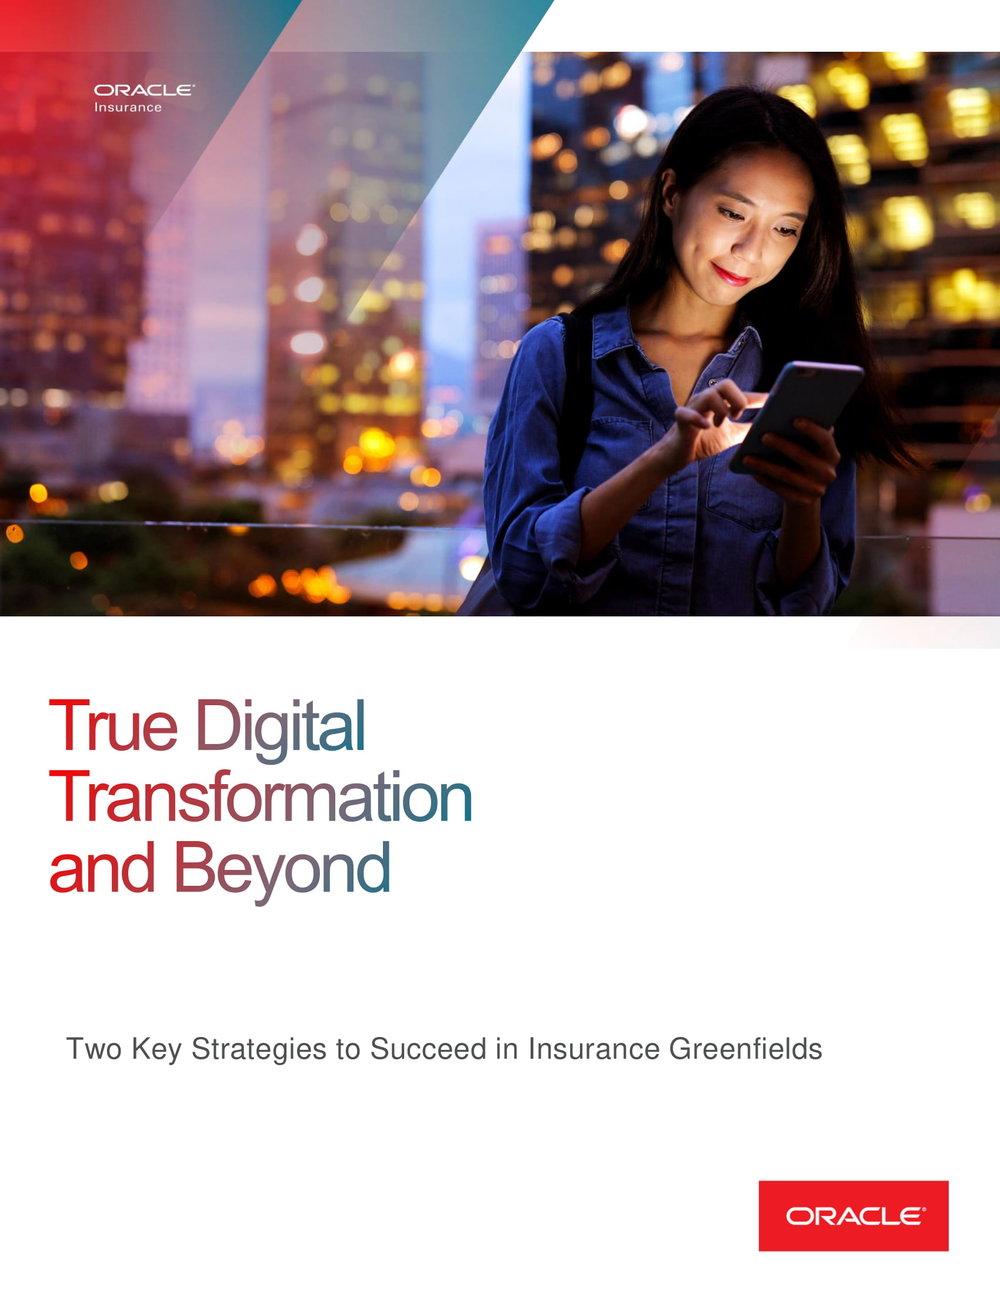 True Digital Transformation and Beyond